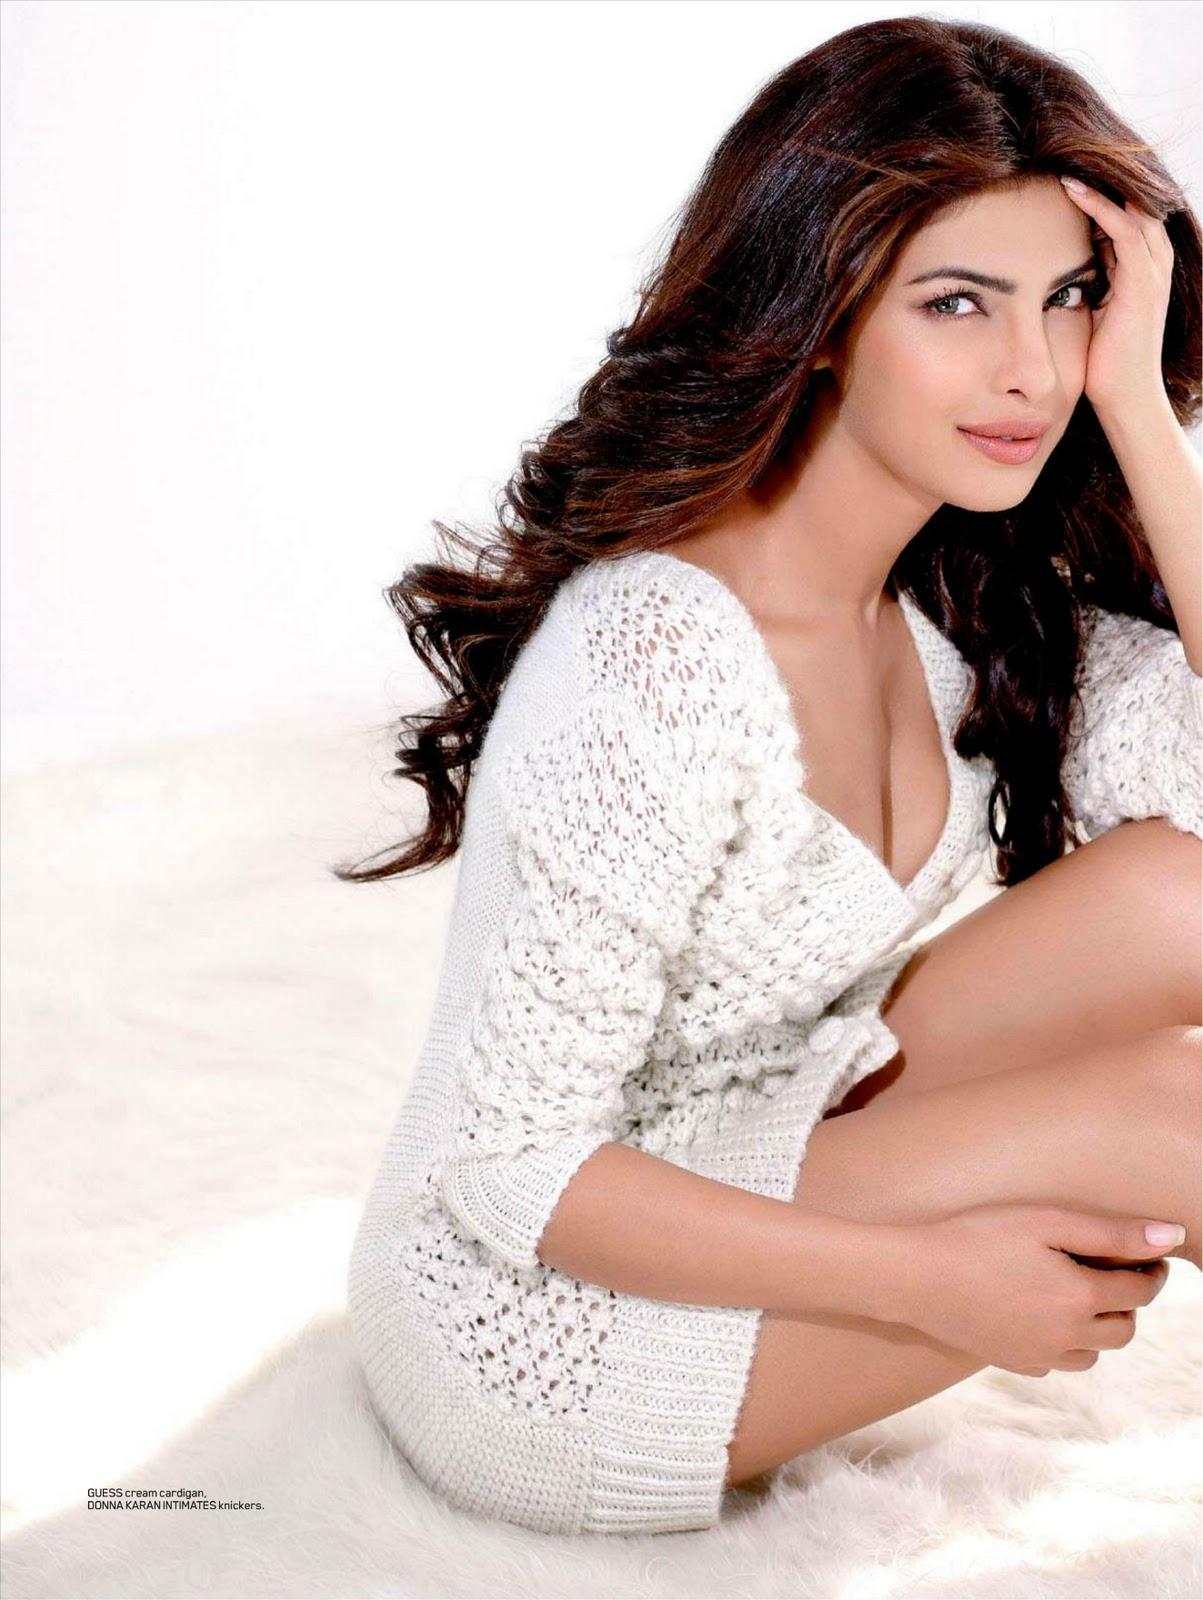 Priyanka Chopra Photoshoot For Maxim India Oct2011 Bollywood